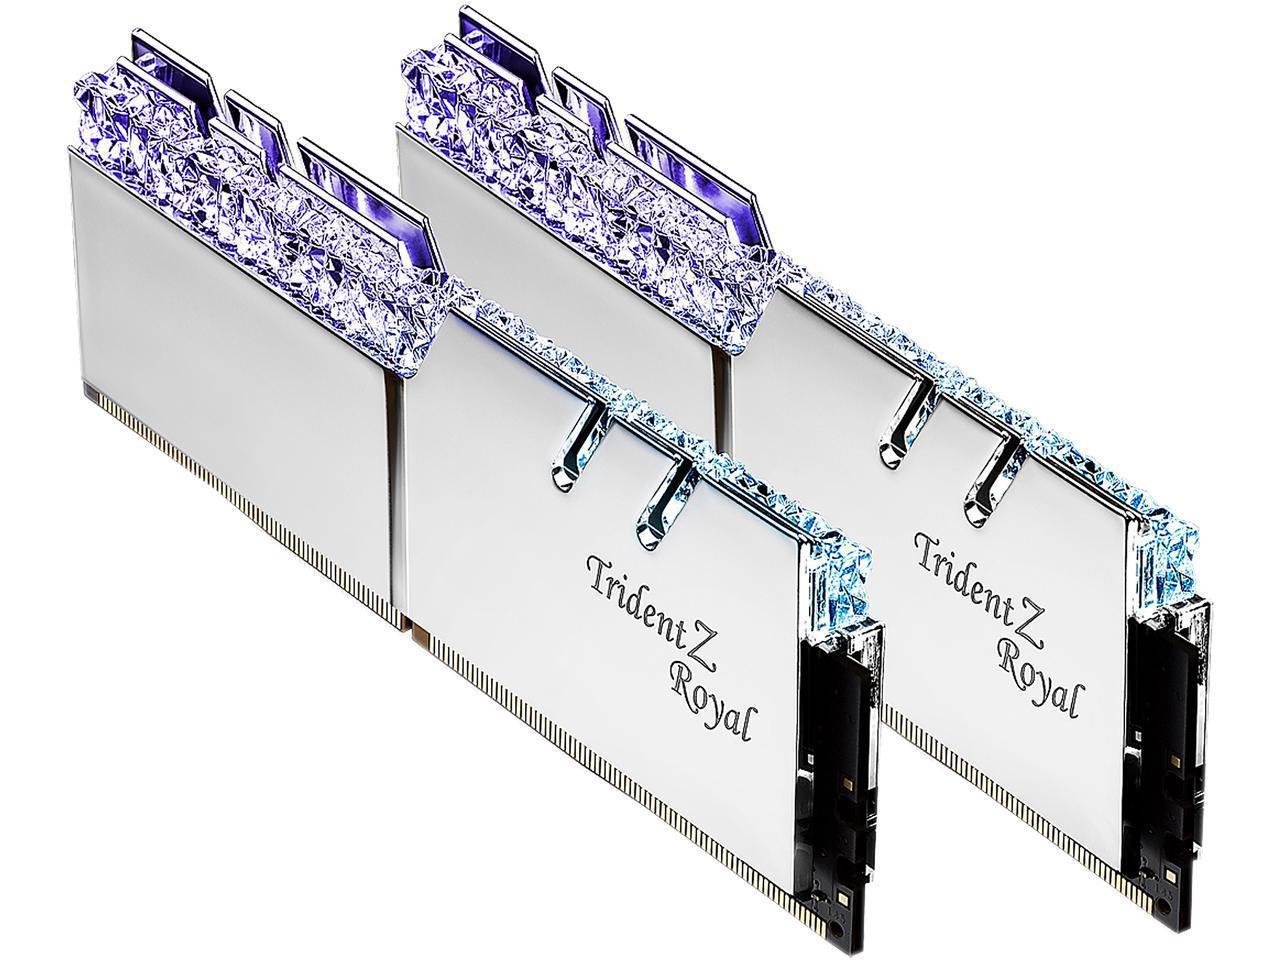 Review: G Skill Trident Z Royal 16GB DDR4-3600 (F4-3600C18D-16GTRS